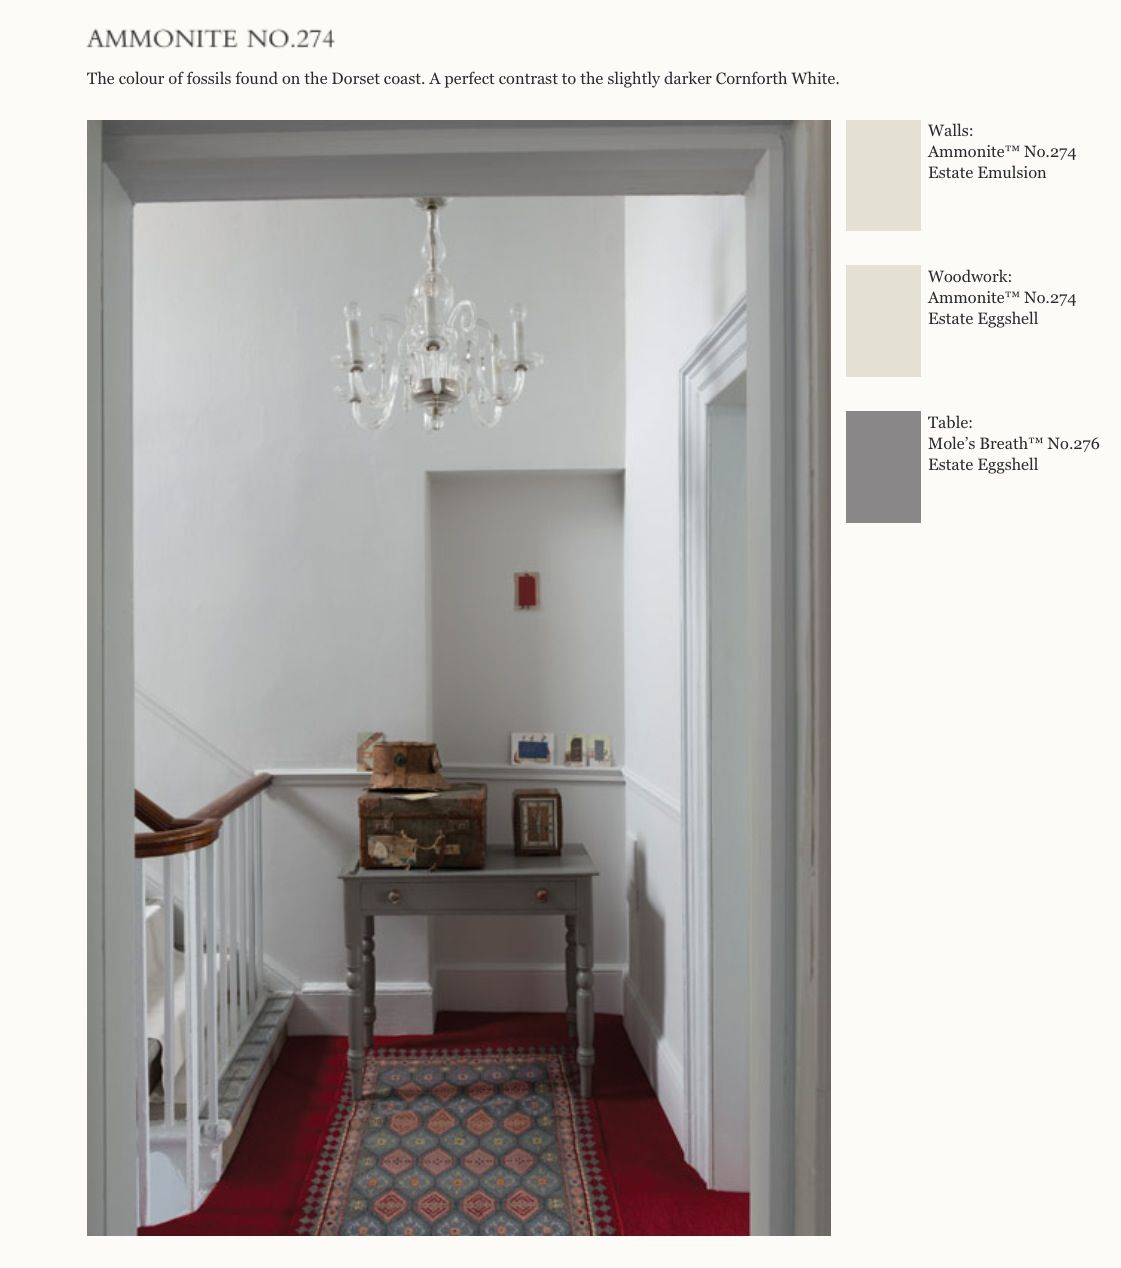 farrow ball color ammonite no 274 paint wallpaper pinterest ammonite farrow ball and. Black Bedroom Furniture Sets. Home Design Ideas